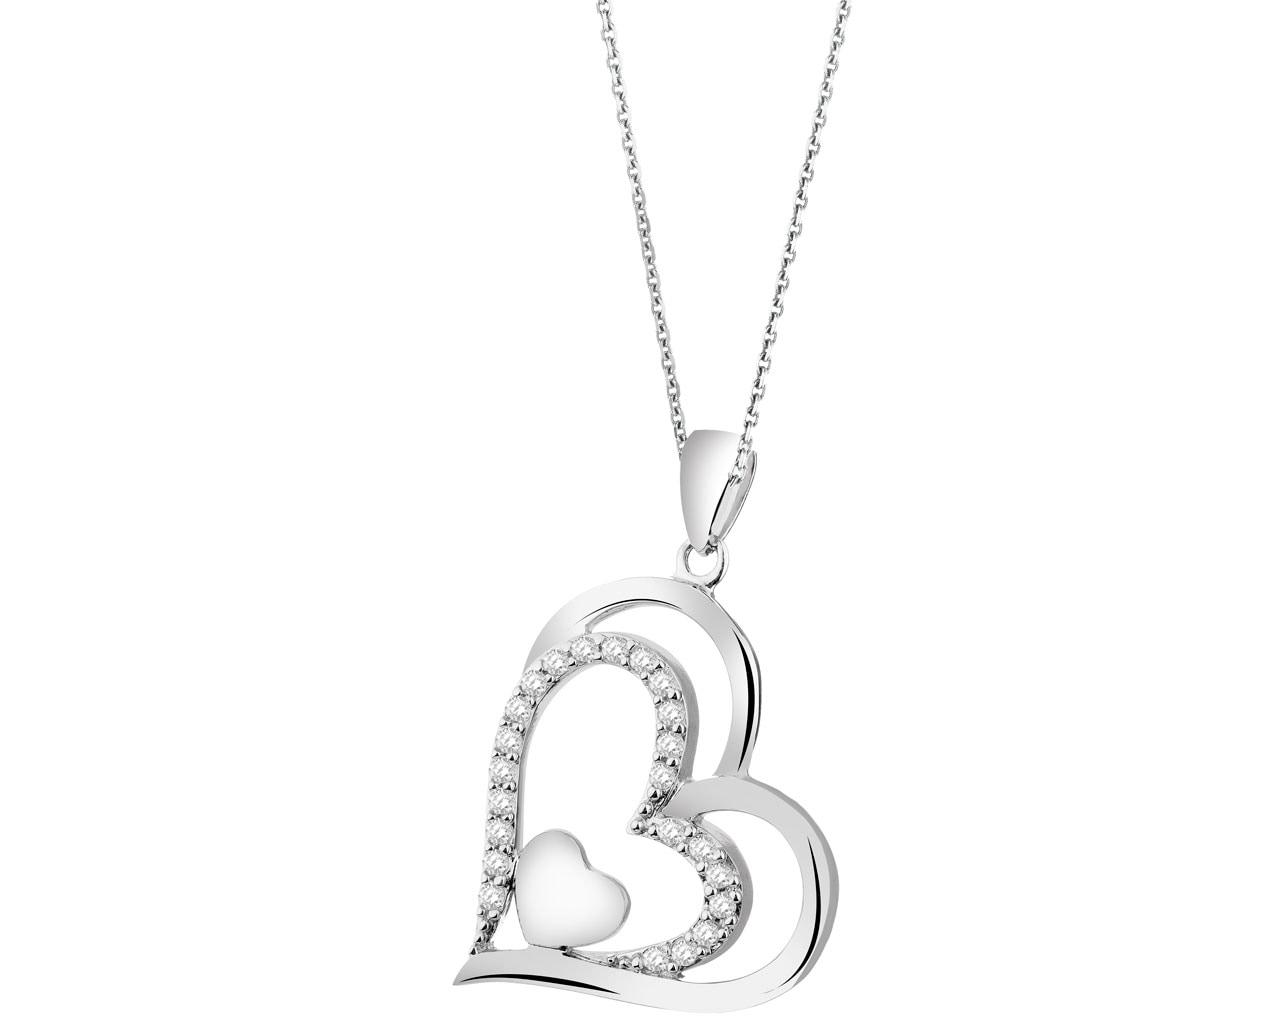 f6256ad3aba89a Zawieszka srebrna z cyrkoniami - serca - wzór AP523-0780 / Apart